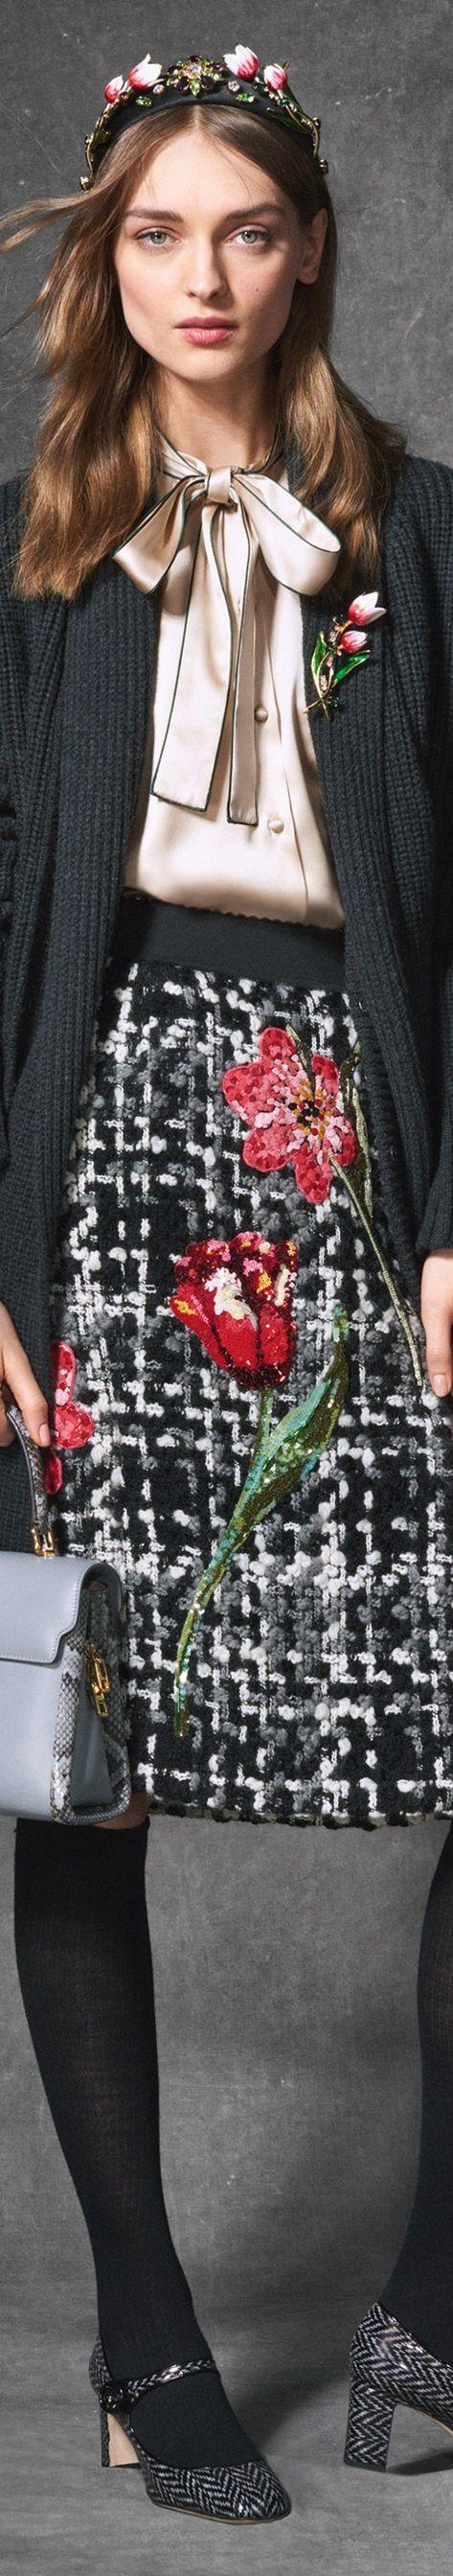 Dolce and Gabbana FW 2016 Collection Wonderland